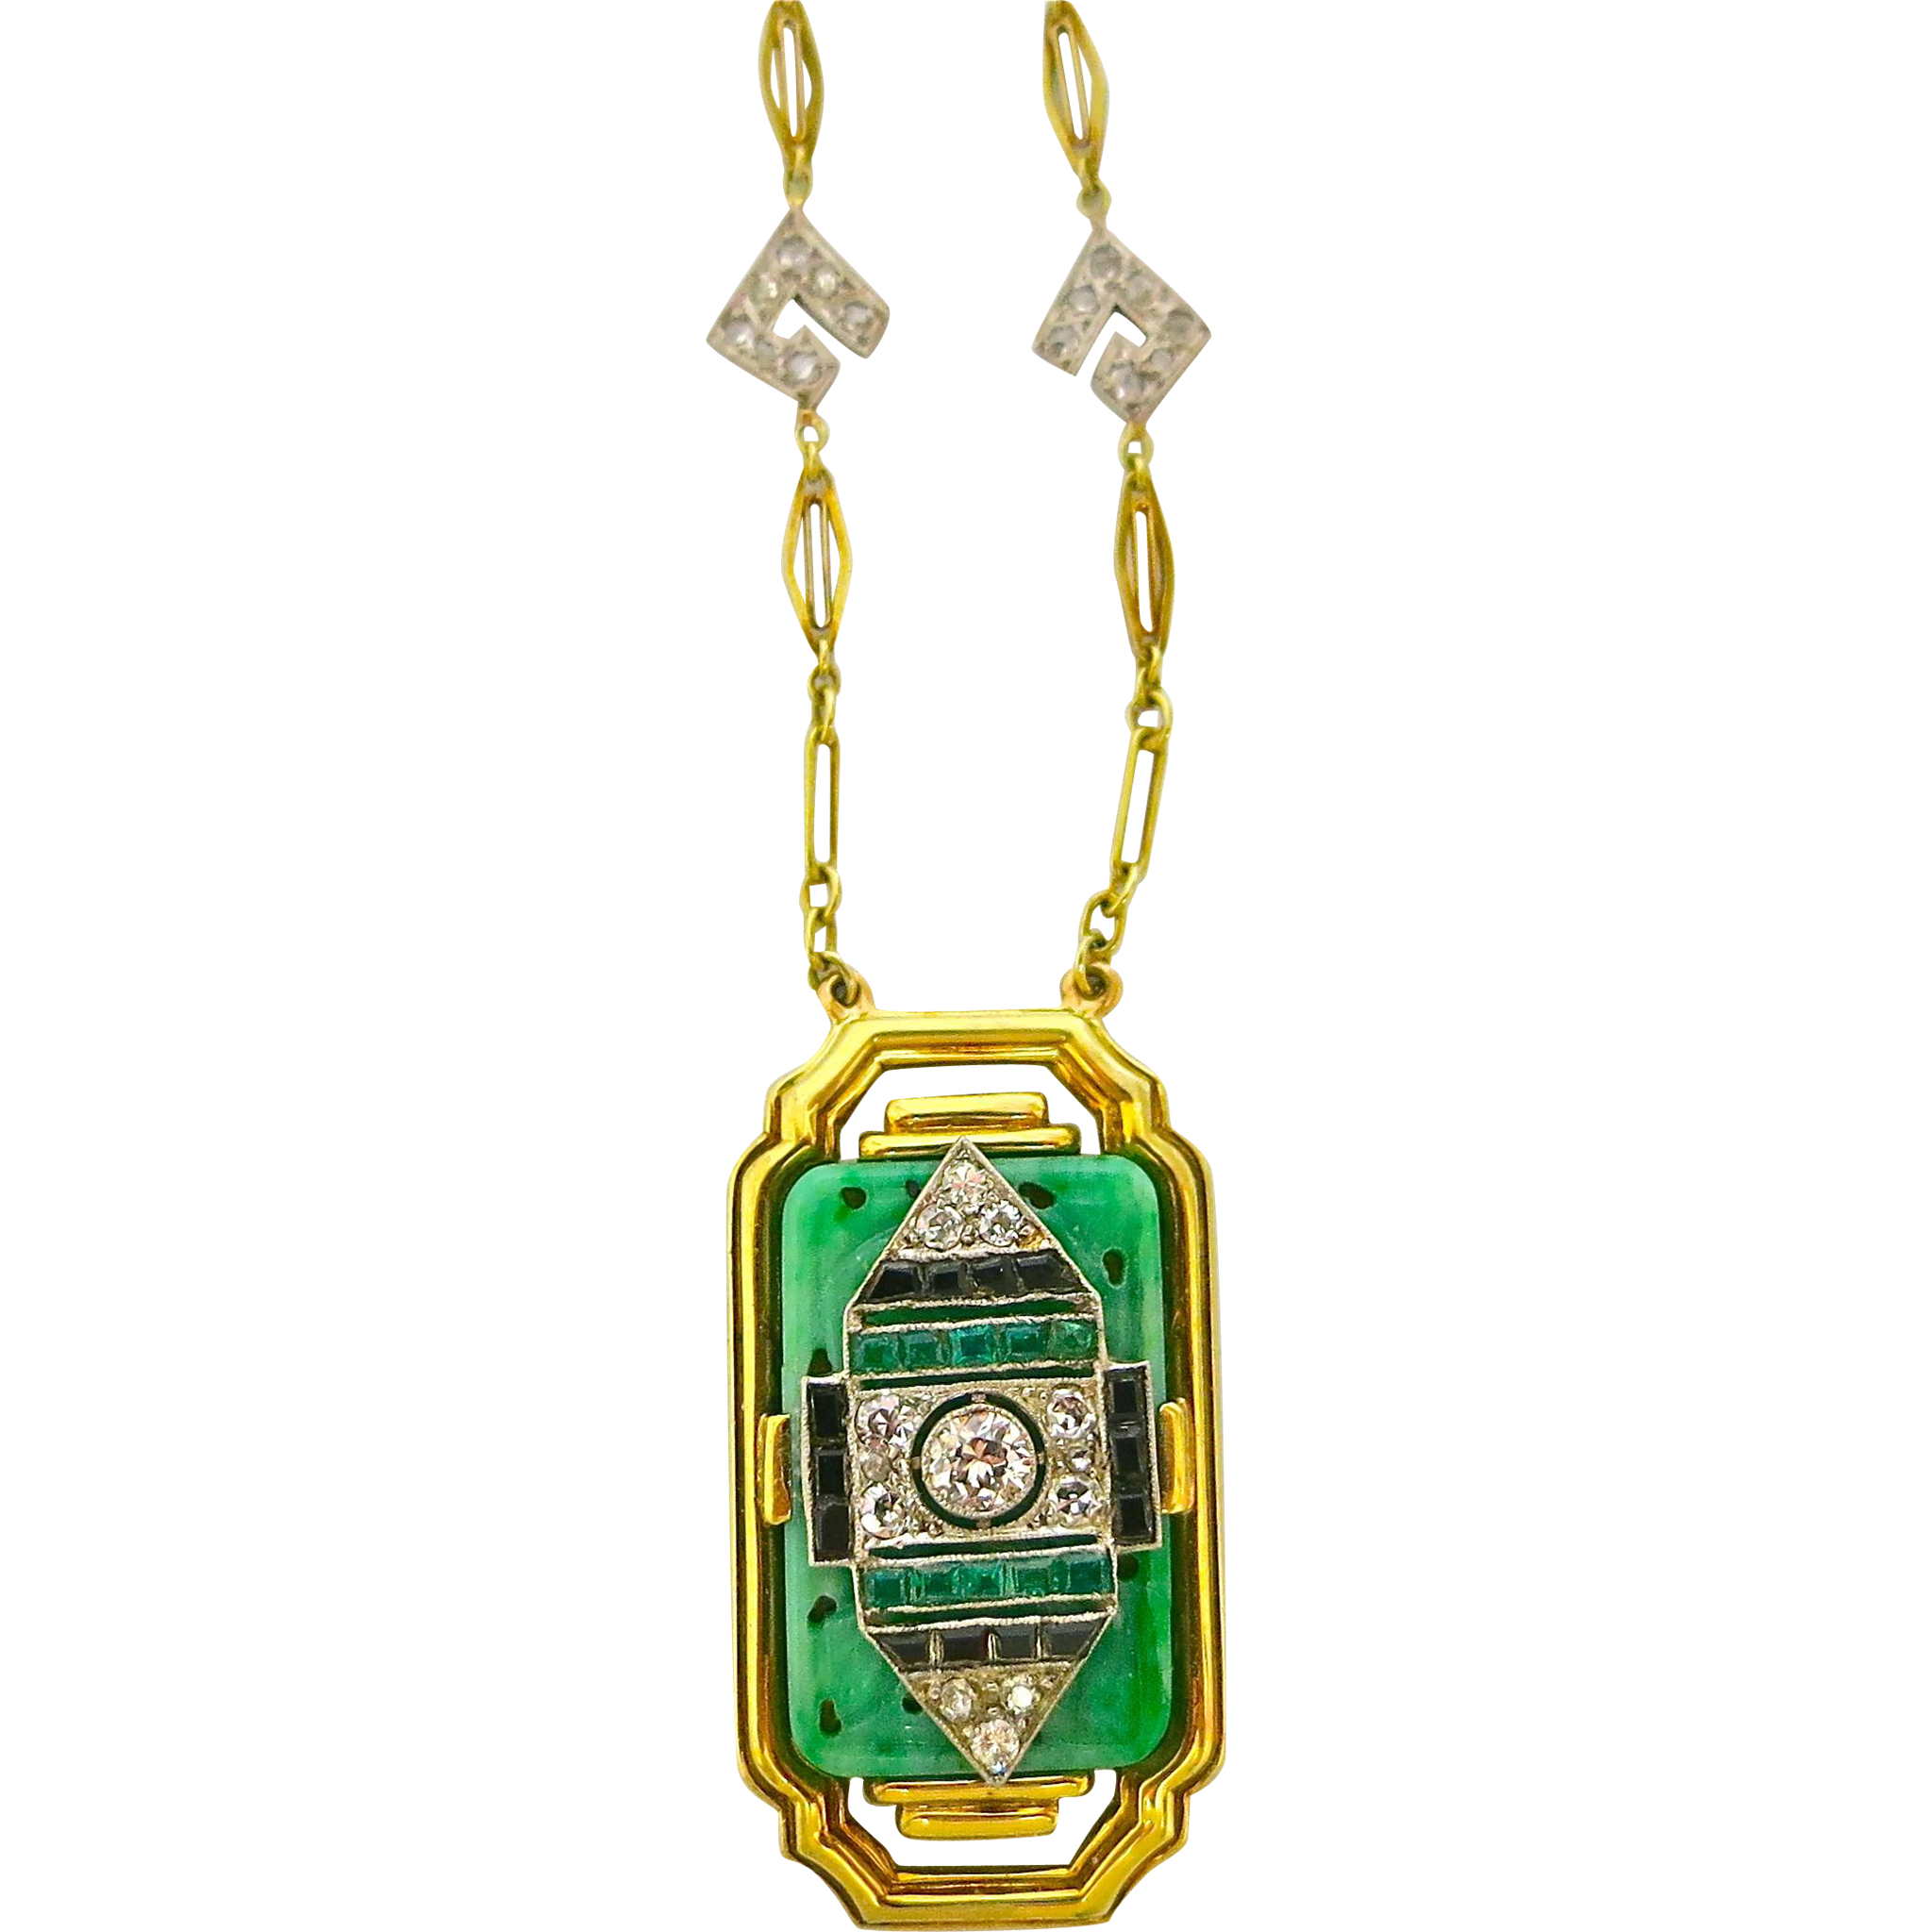 Art deco 14K Gold, Platinum, Diamond, Jade, Onyx & Emerald Necklace